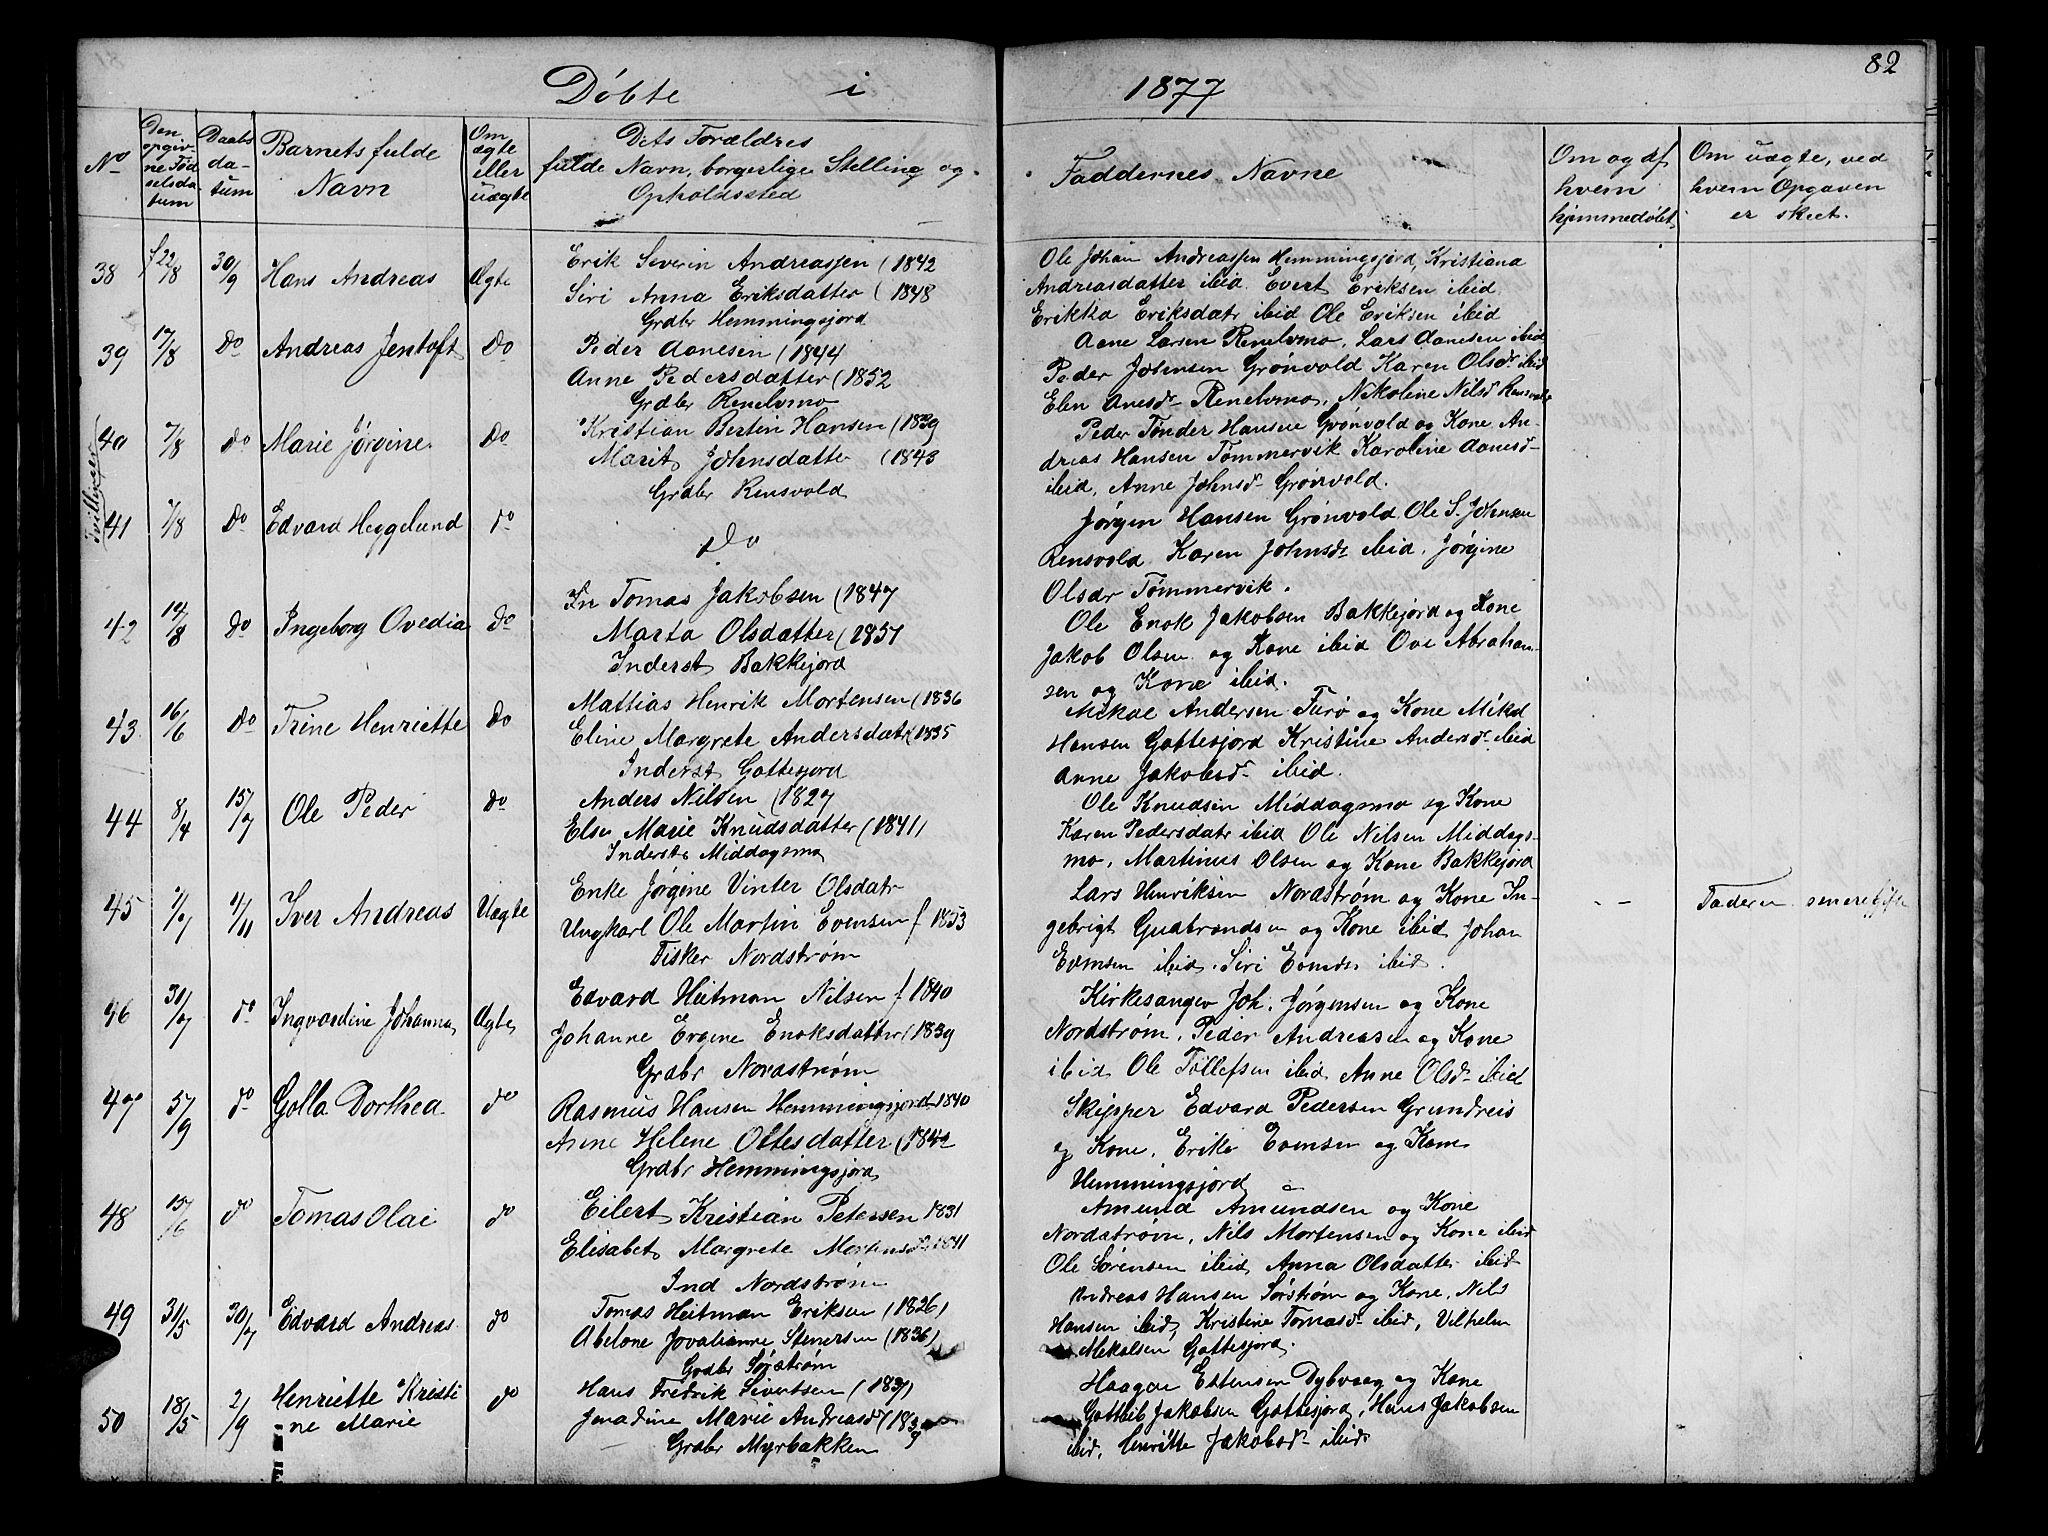 SATØ, Tranøy sokneprestkontor, I/Ia/Iab/L0021klokker: Klokkerbok nr. 21, 1861-1886, s. 82